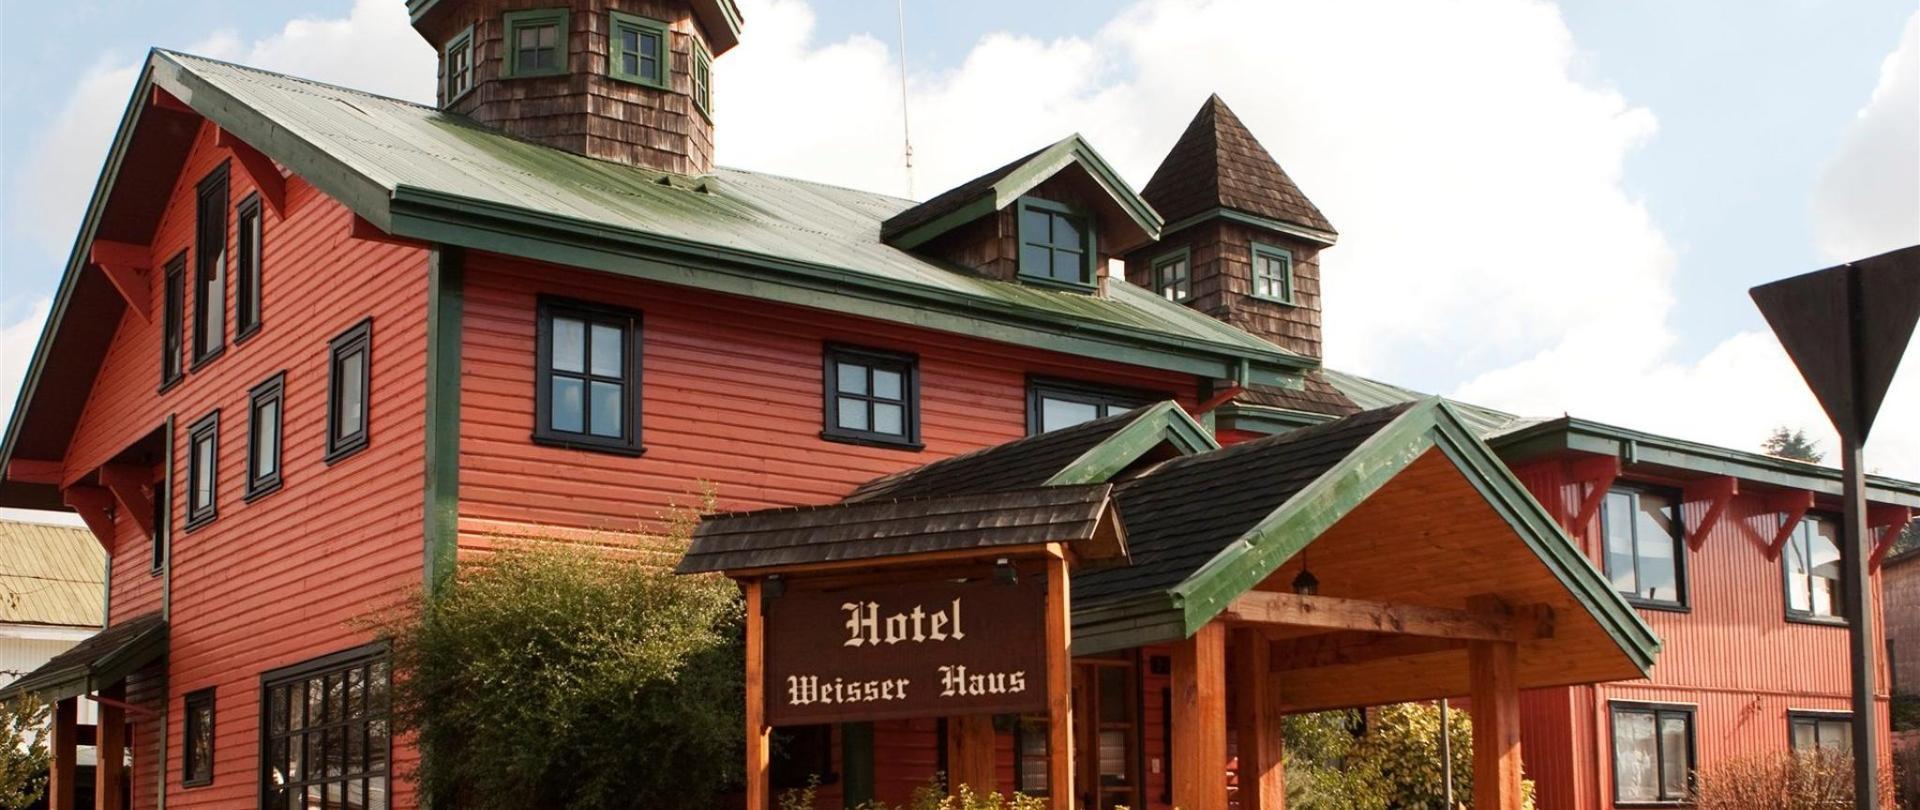 Weisserhaus Hotels .jpg